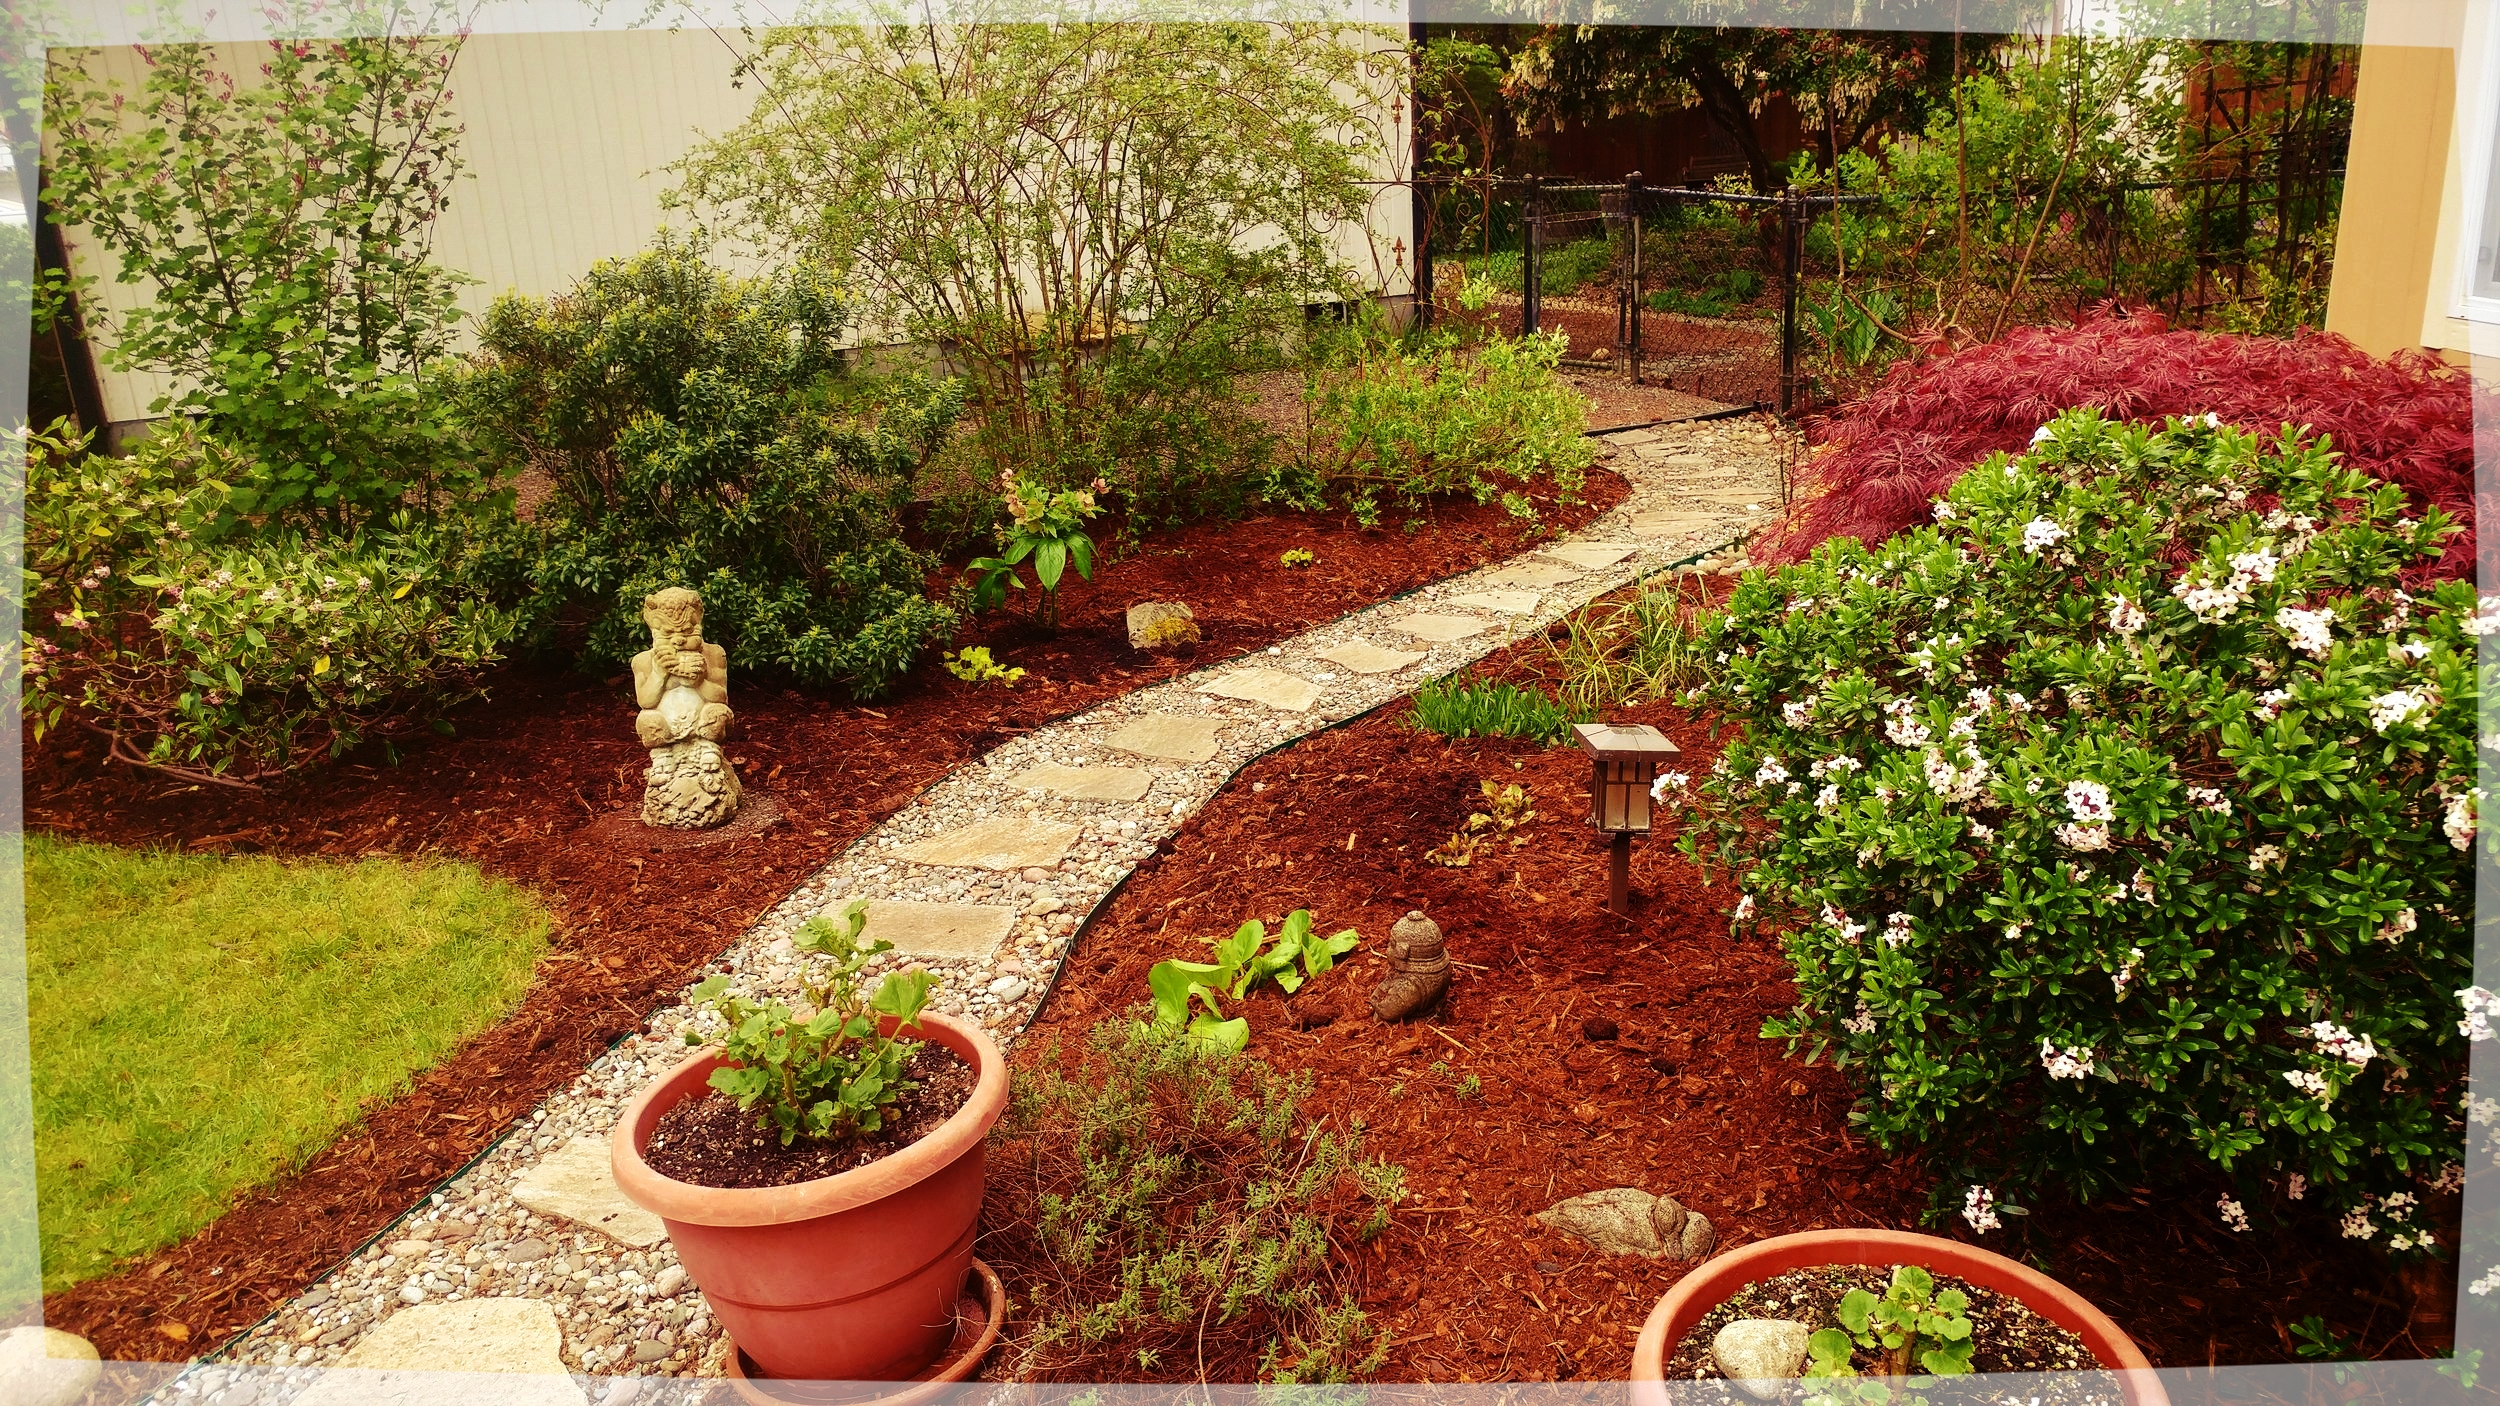 Less Path Equals More Plants